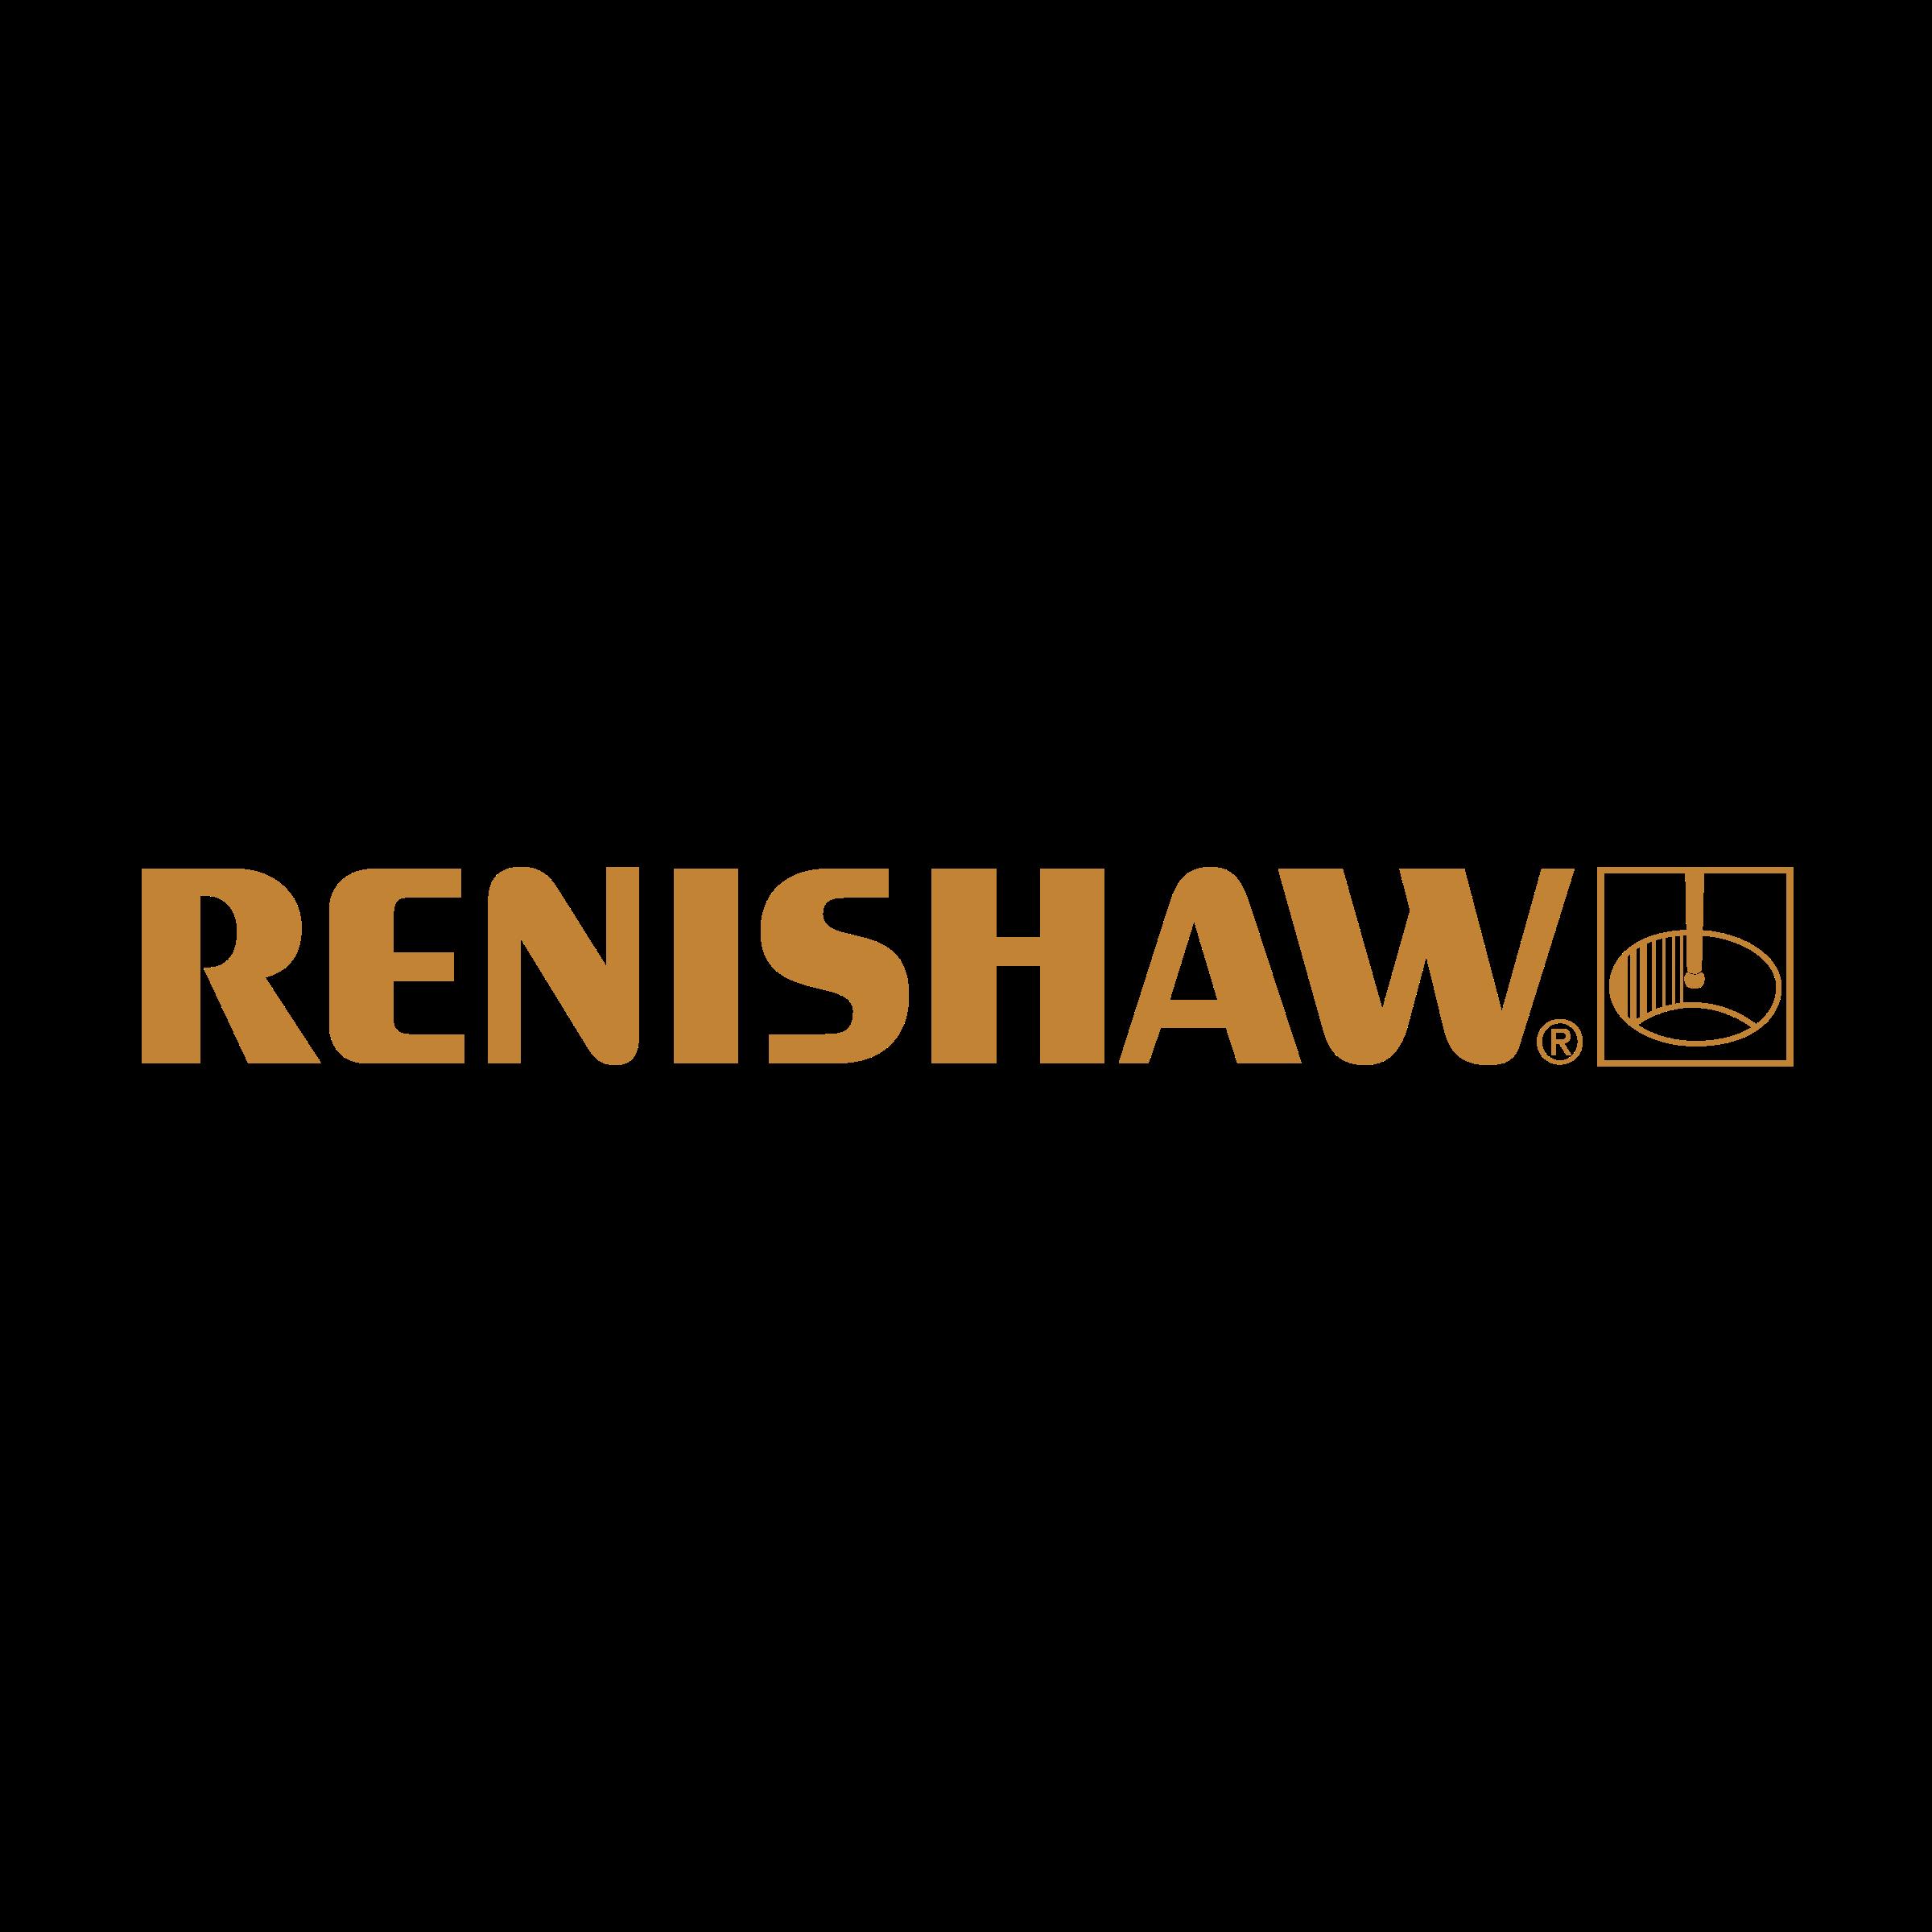 The logo Renishaw Plc